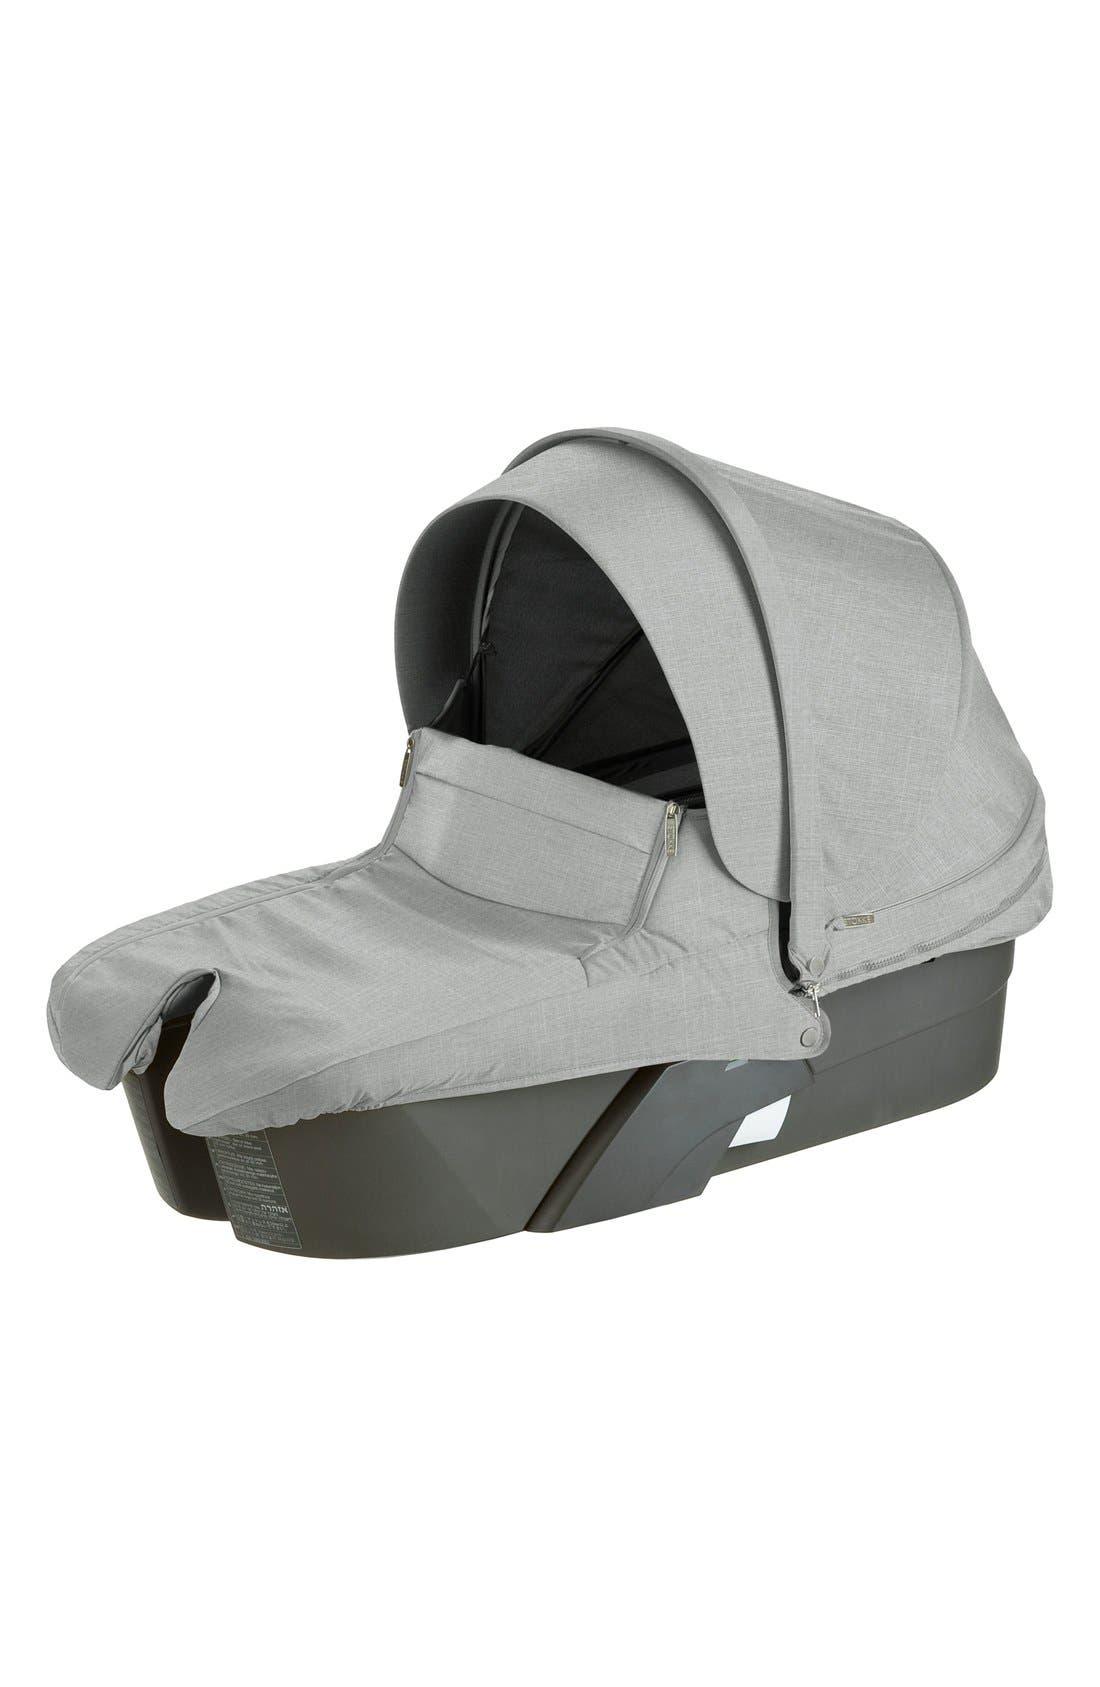 'Xplory<sup>®</sup>' Stroller Carry Cot,                         Main,                         color, 051